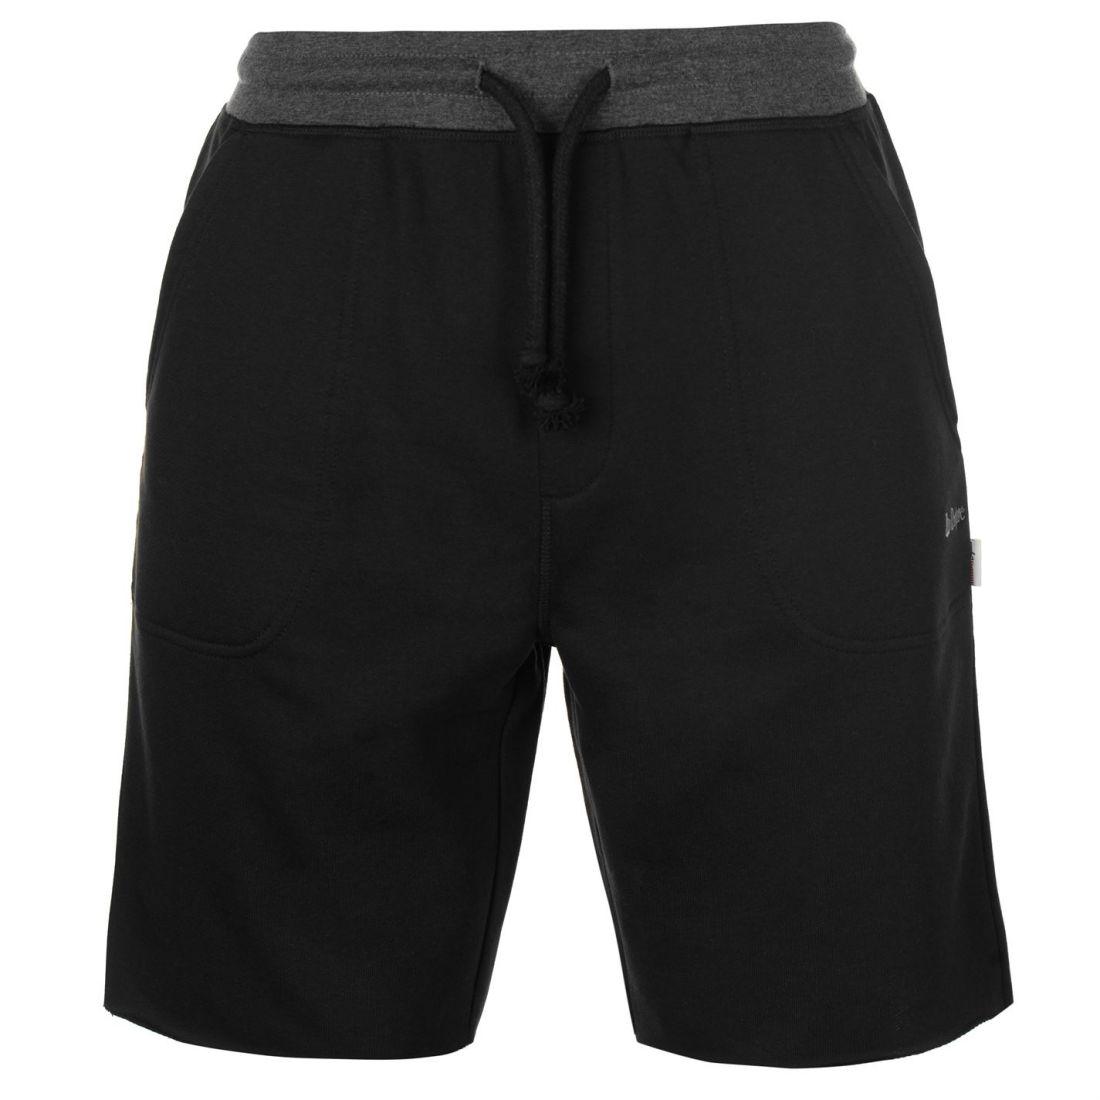 1226b51d20 Swimwear Airwalk Mens Size S M L XL Blue Black & White Cargo Swim Trunk  Shorts New